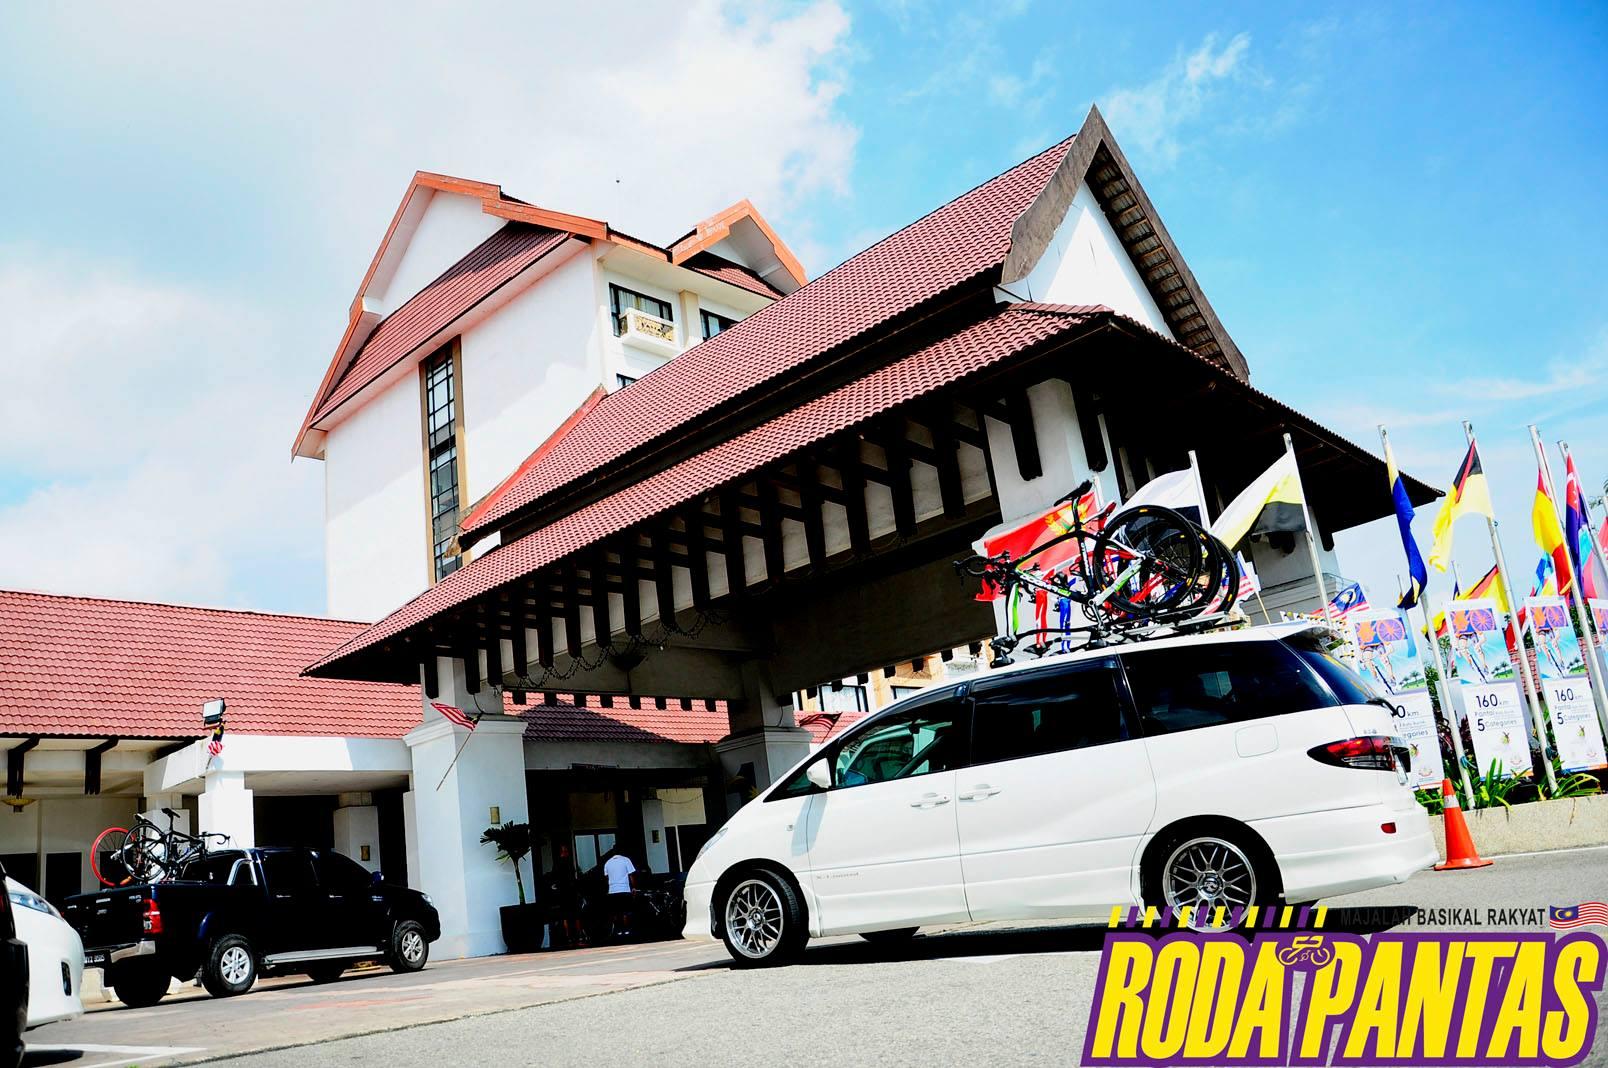 Photo courtesy of Roda Pantas magazine